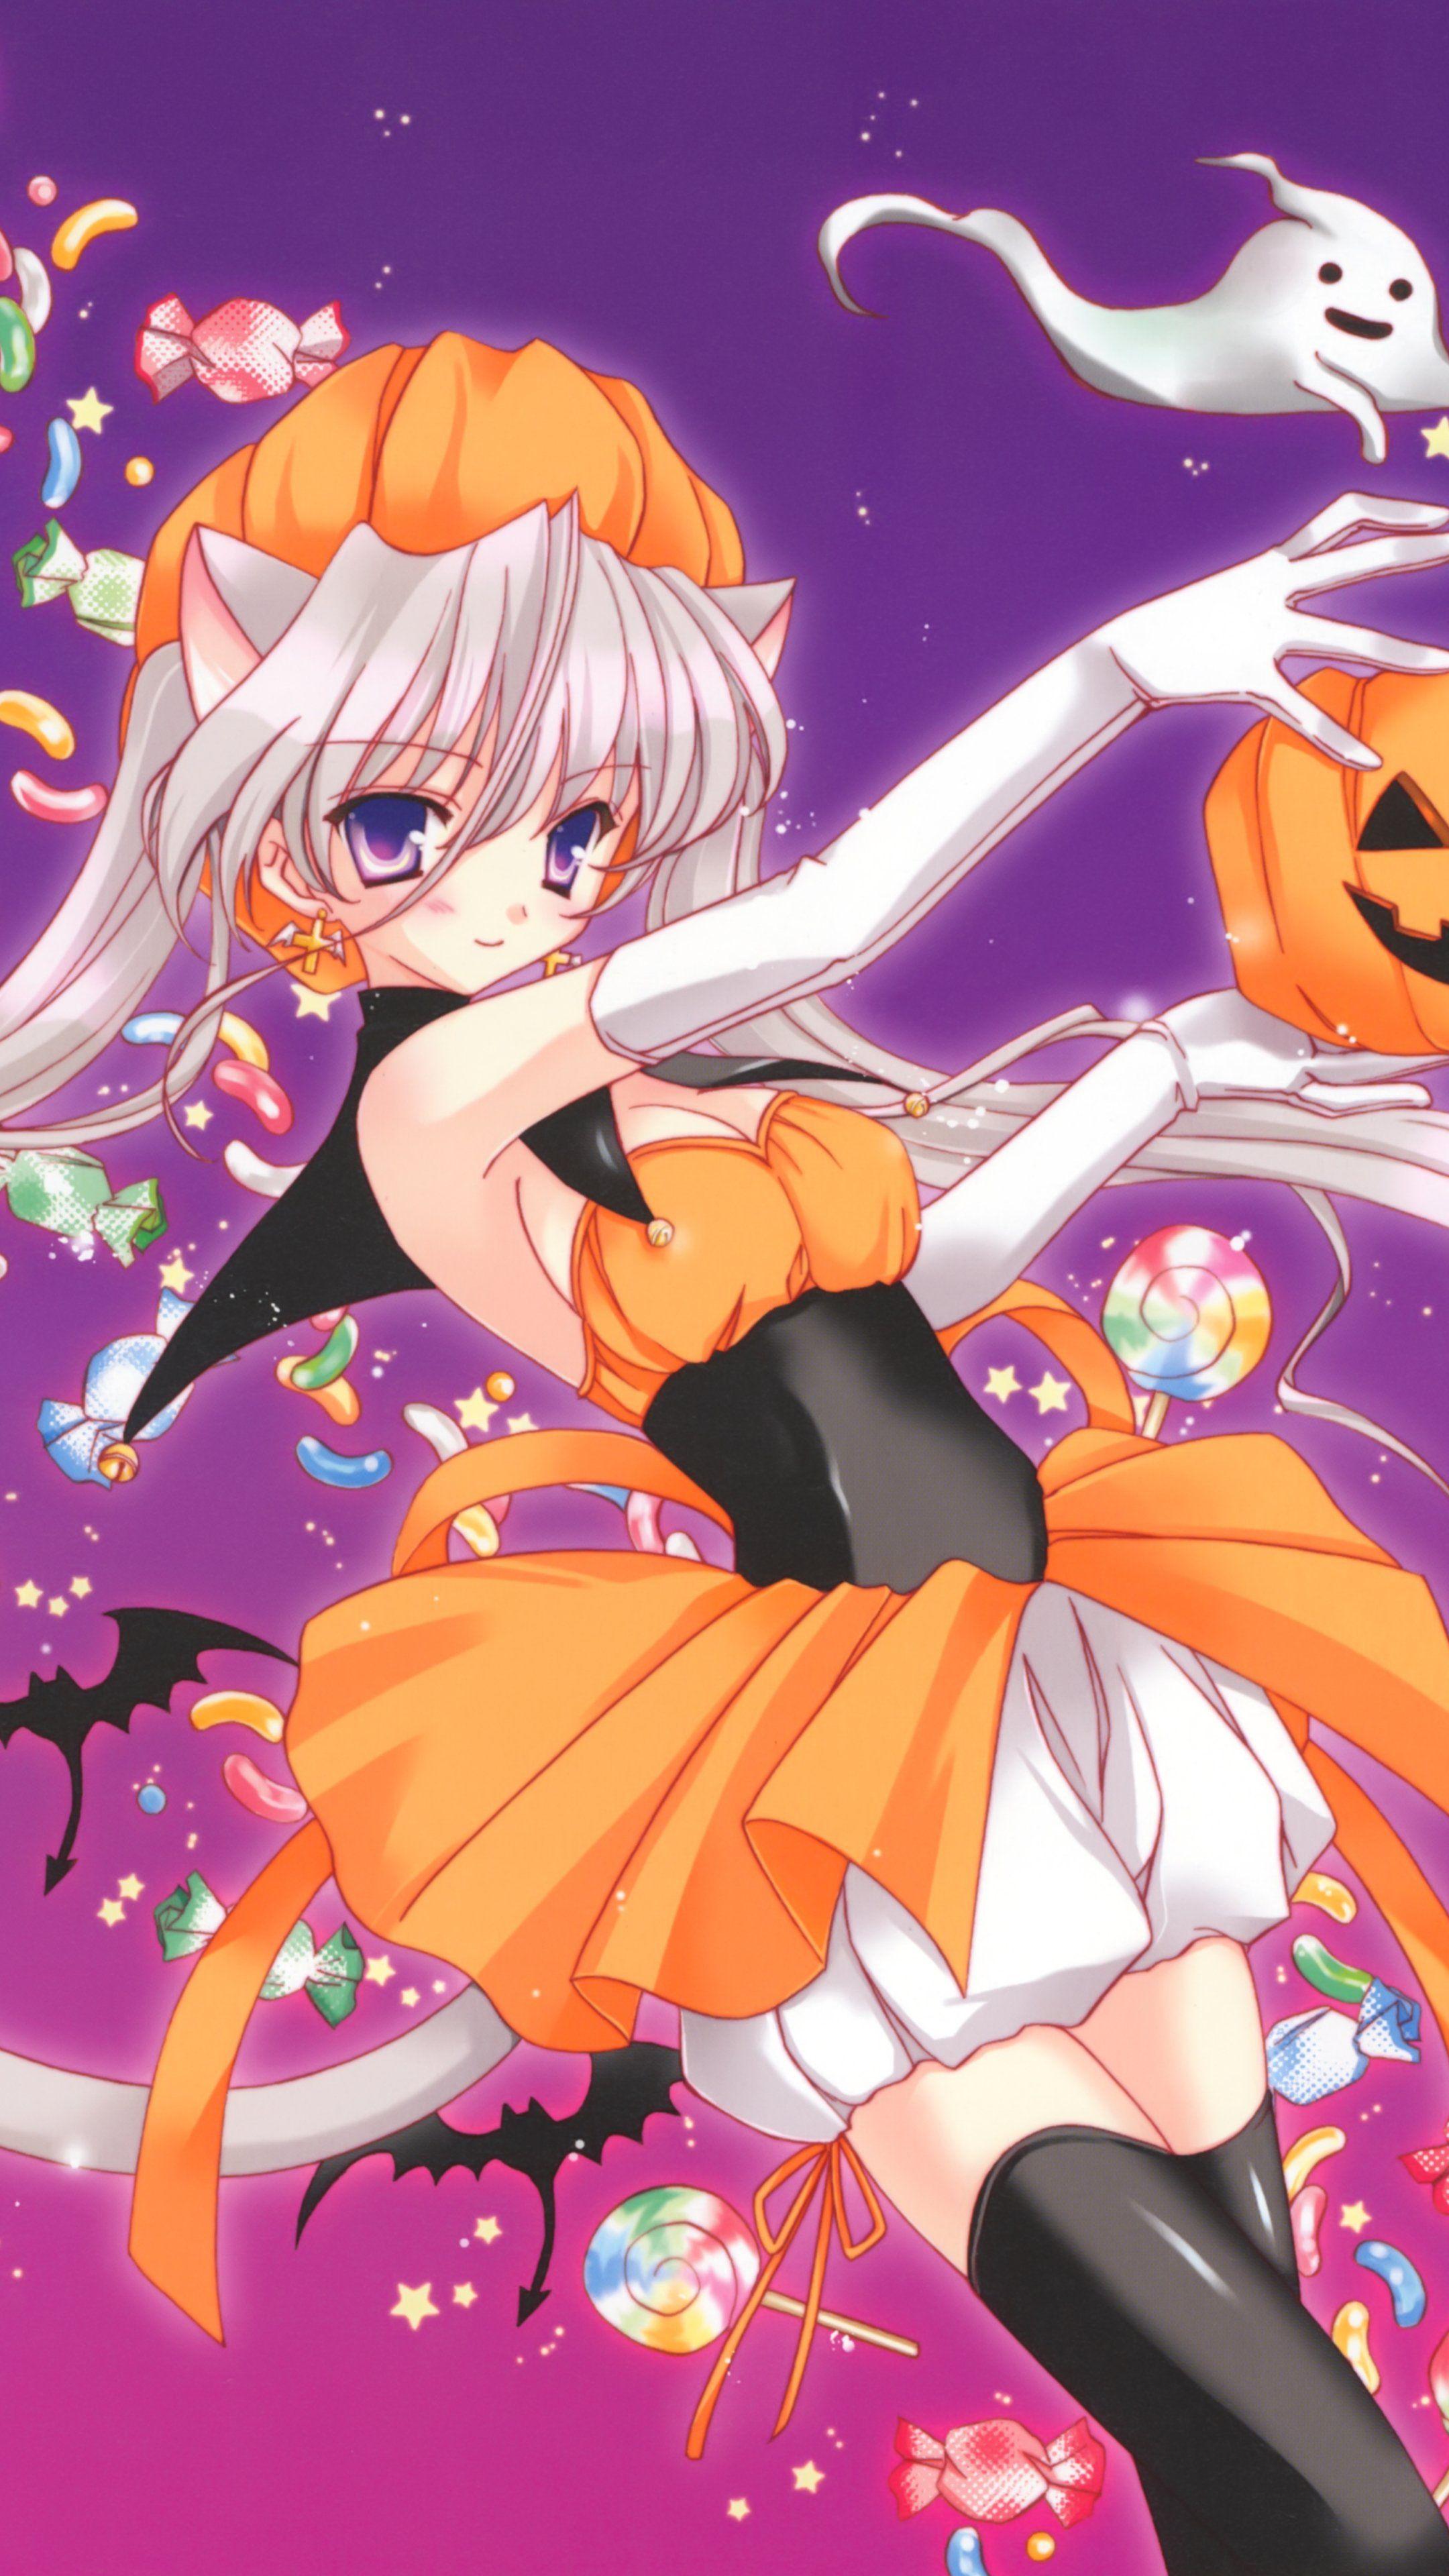 Anime Halloween Wallpaper Backgrounds : anime, halloween, wallpaper, backgrounds, Halloween, Anime, Background, Background,, Halloween,, Wallpaper